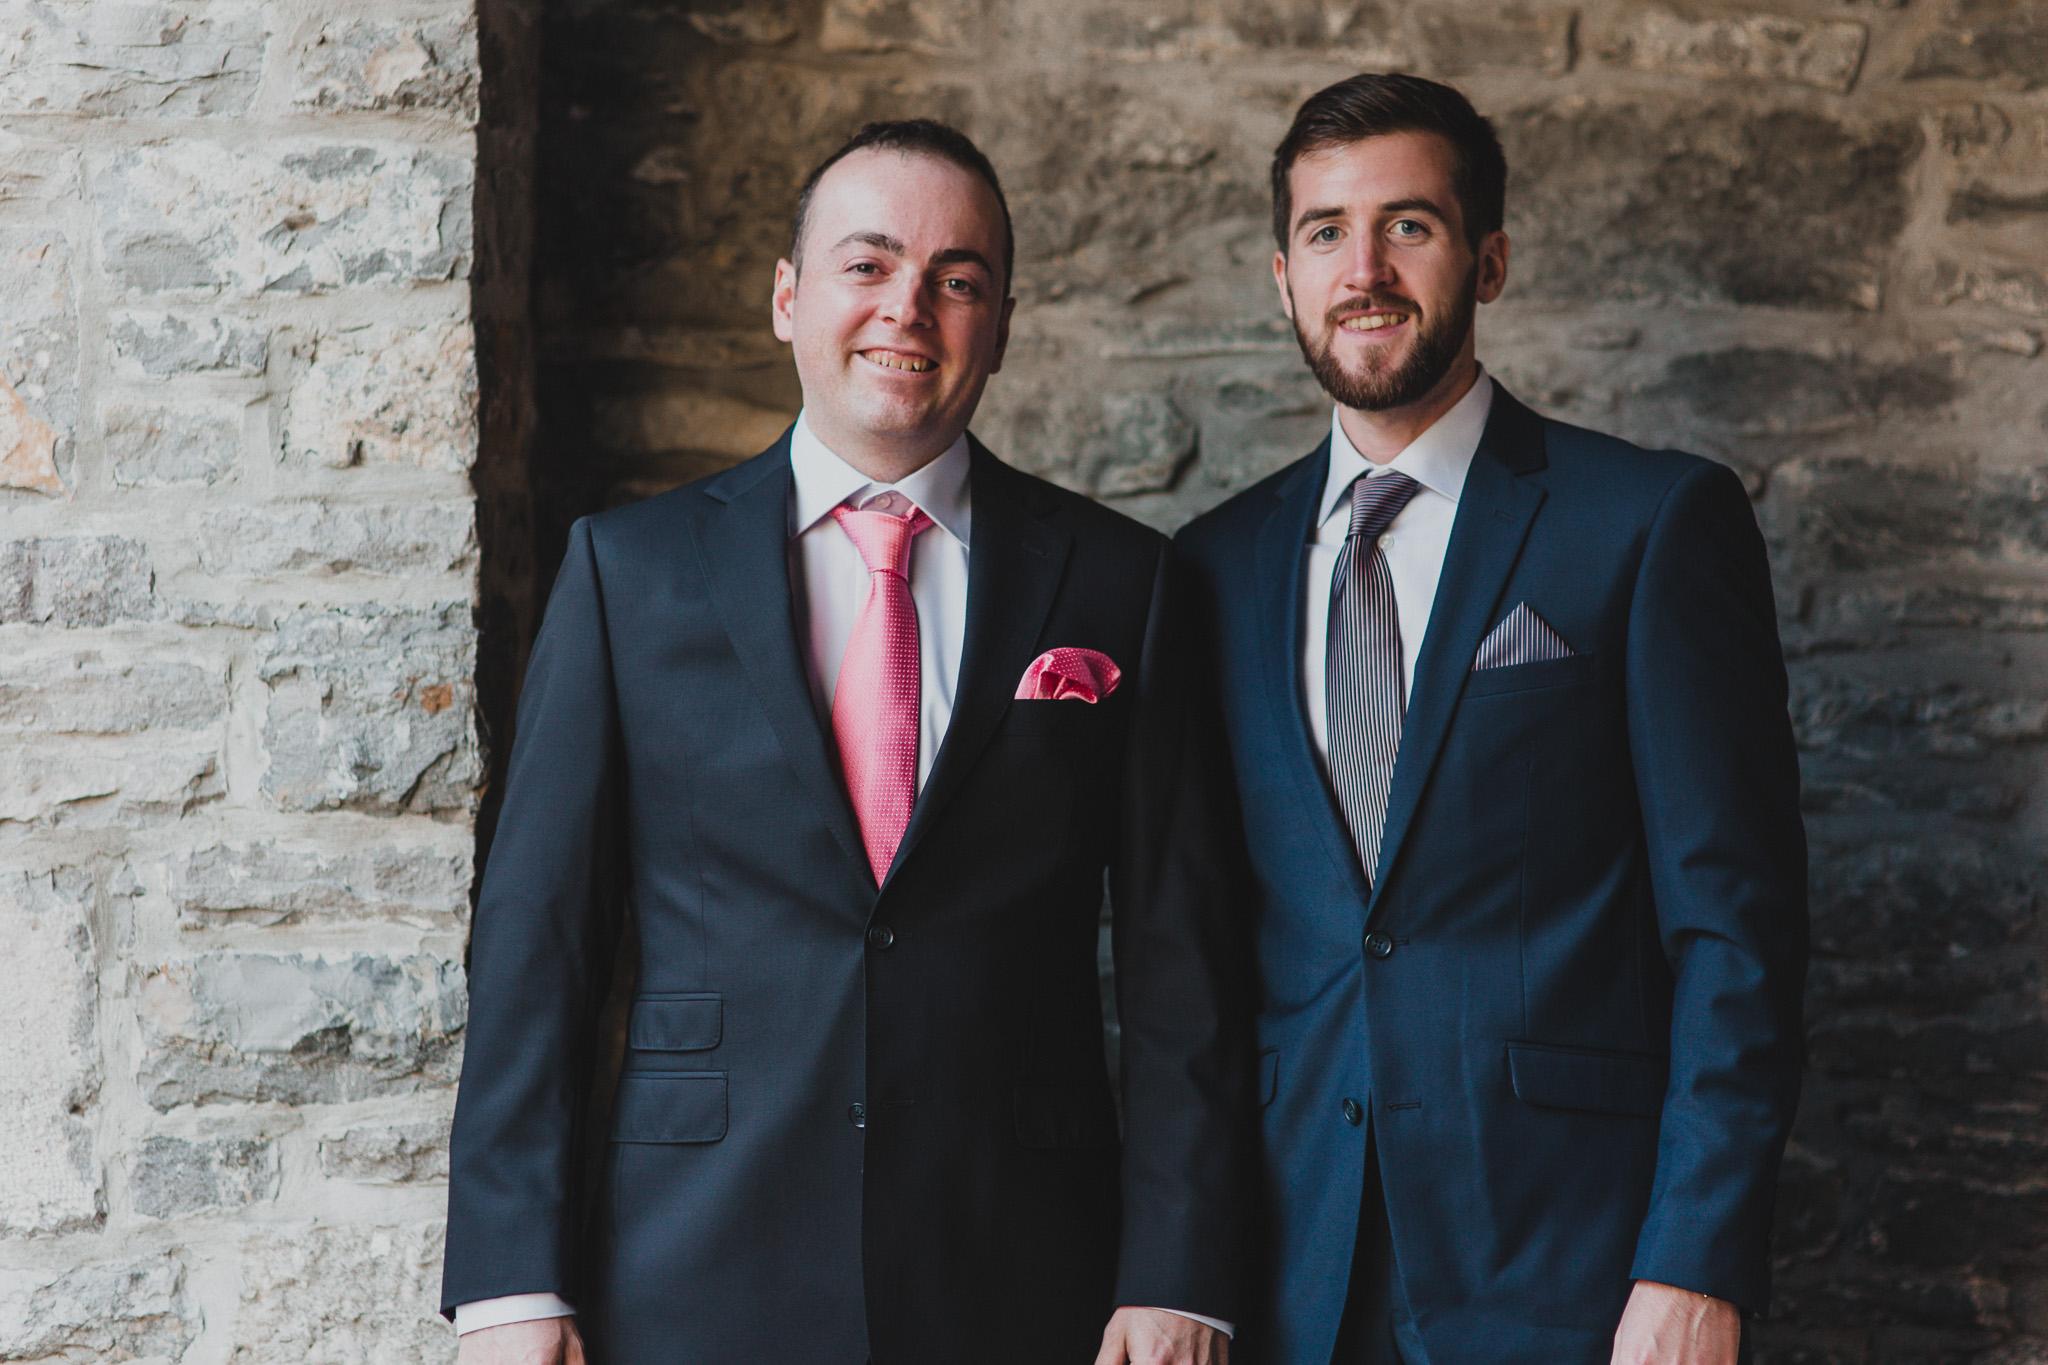 Stone wedding venues, Ottawa Perth Kingston